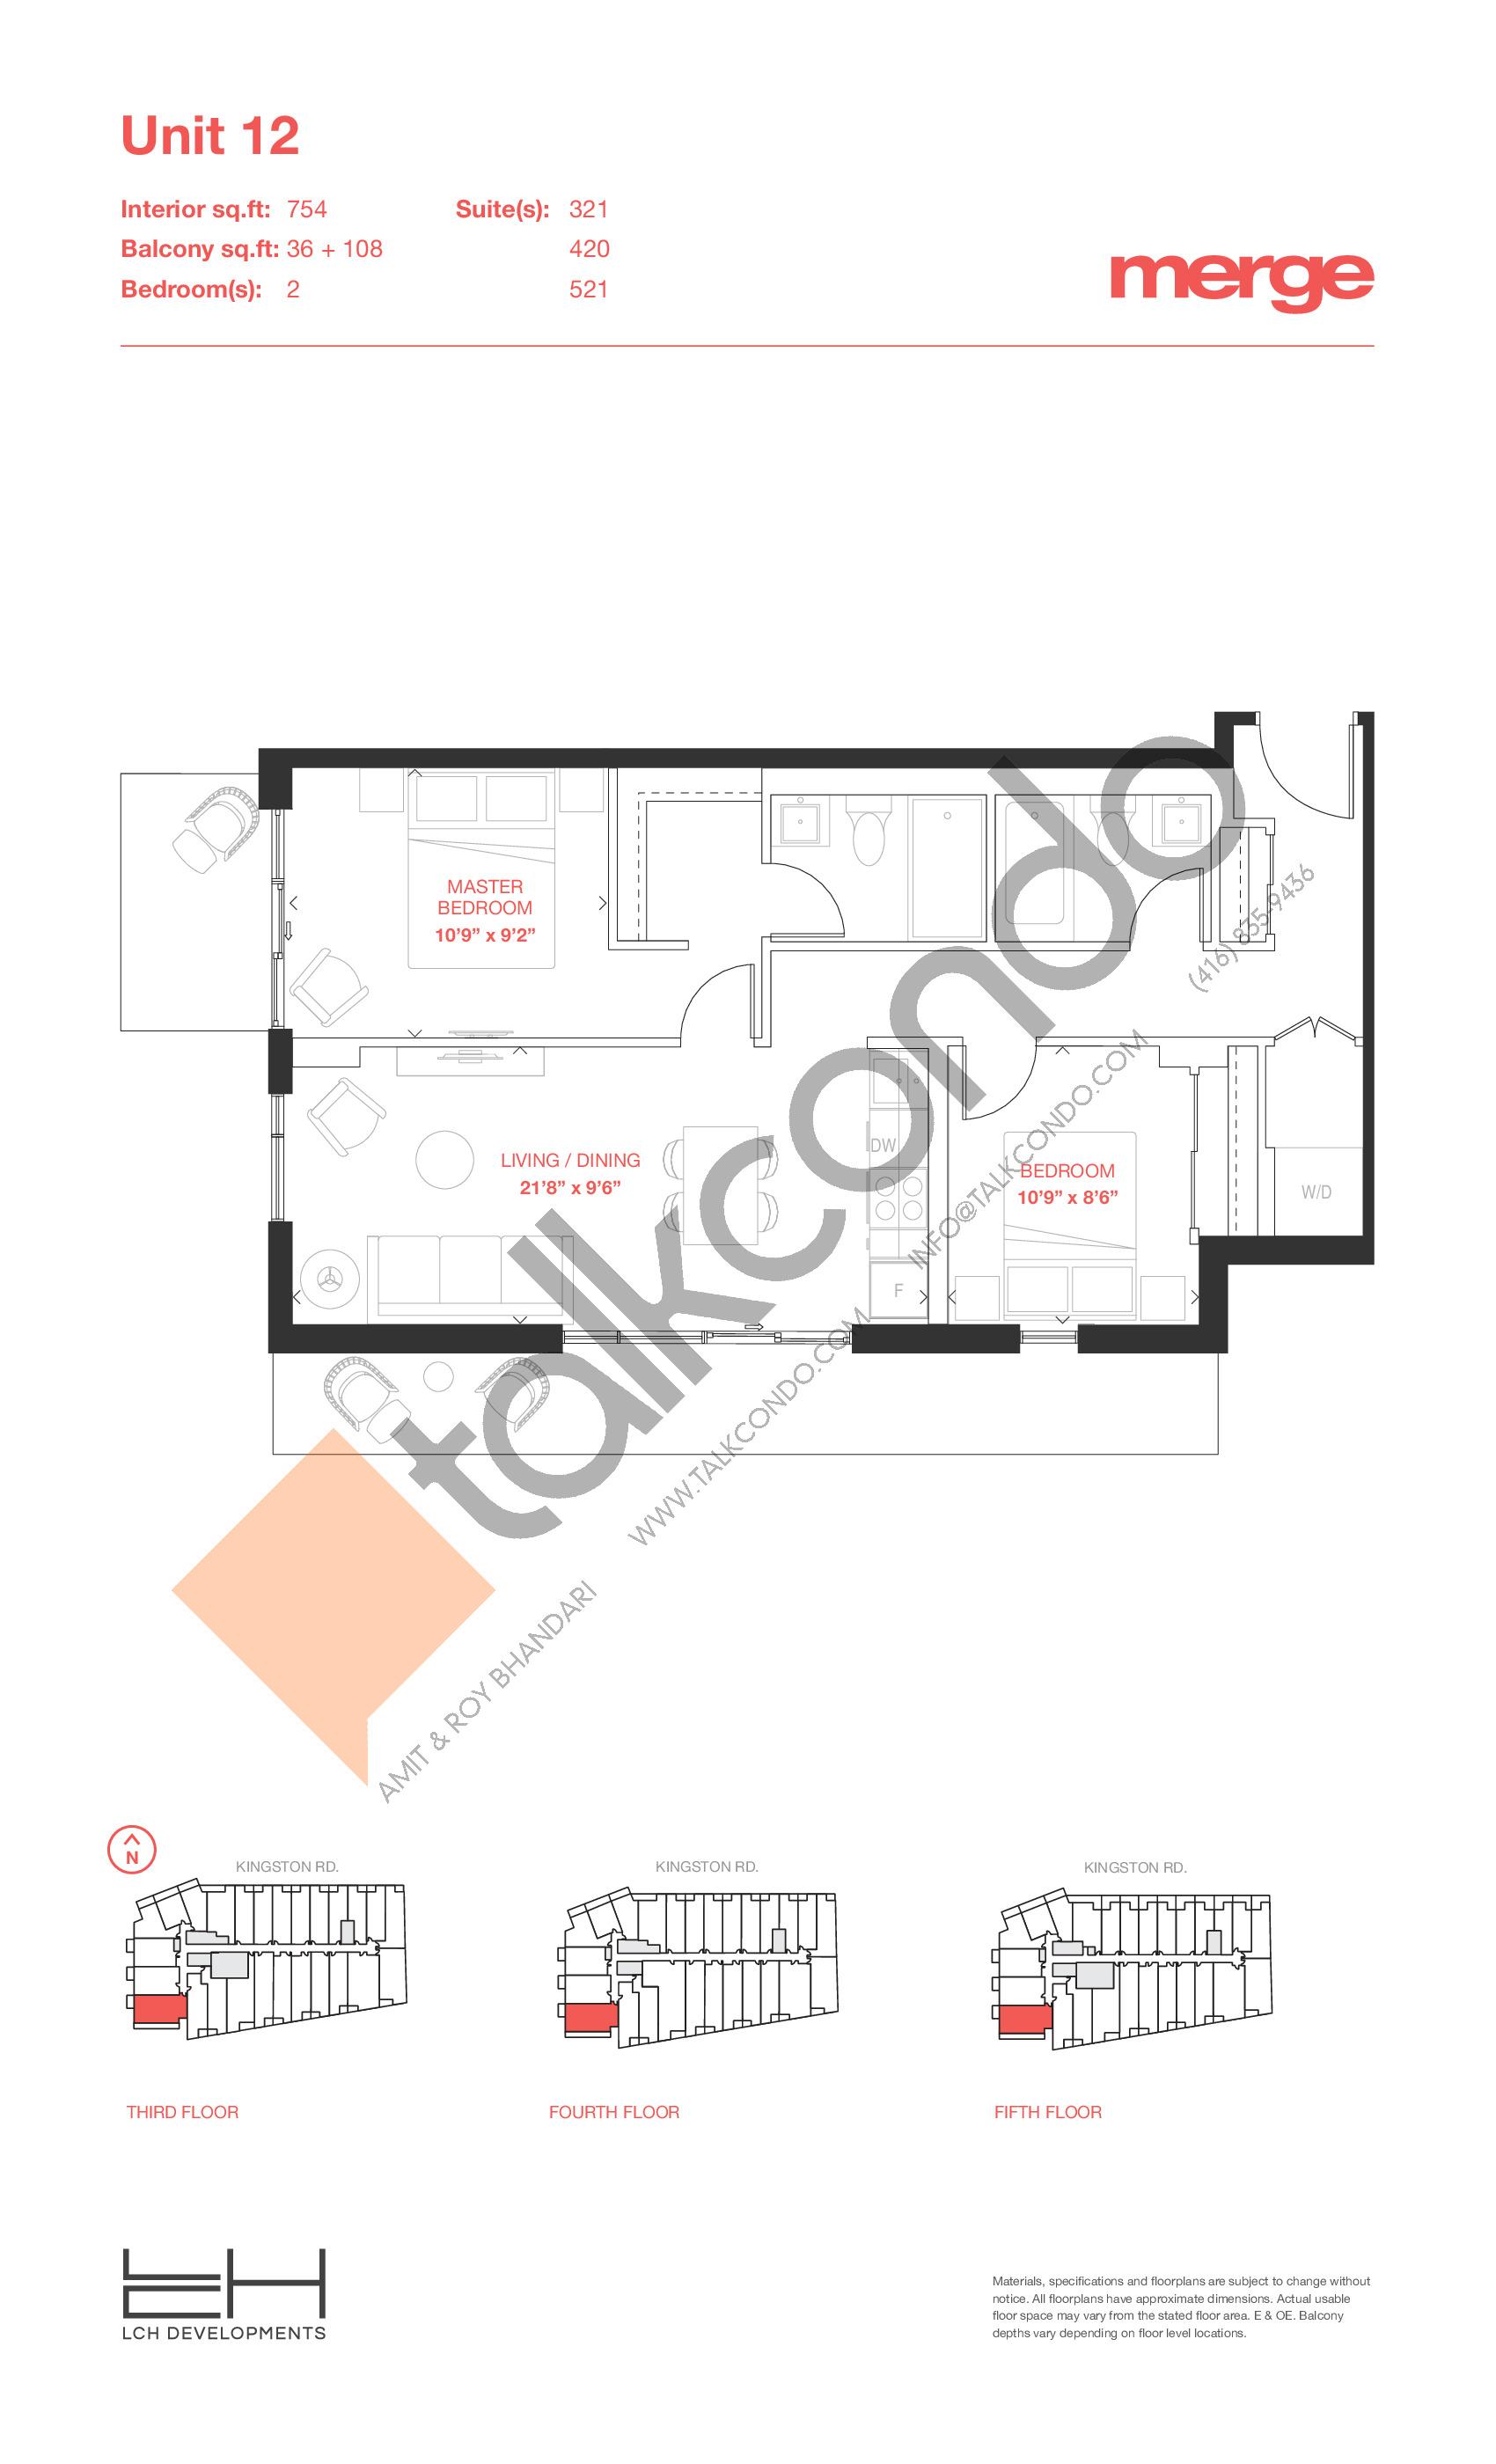 Unit 12 - Tower Floor Plan at Merge Condos - 754 sq.ft